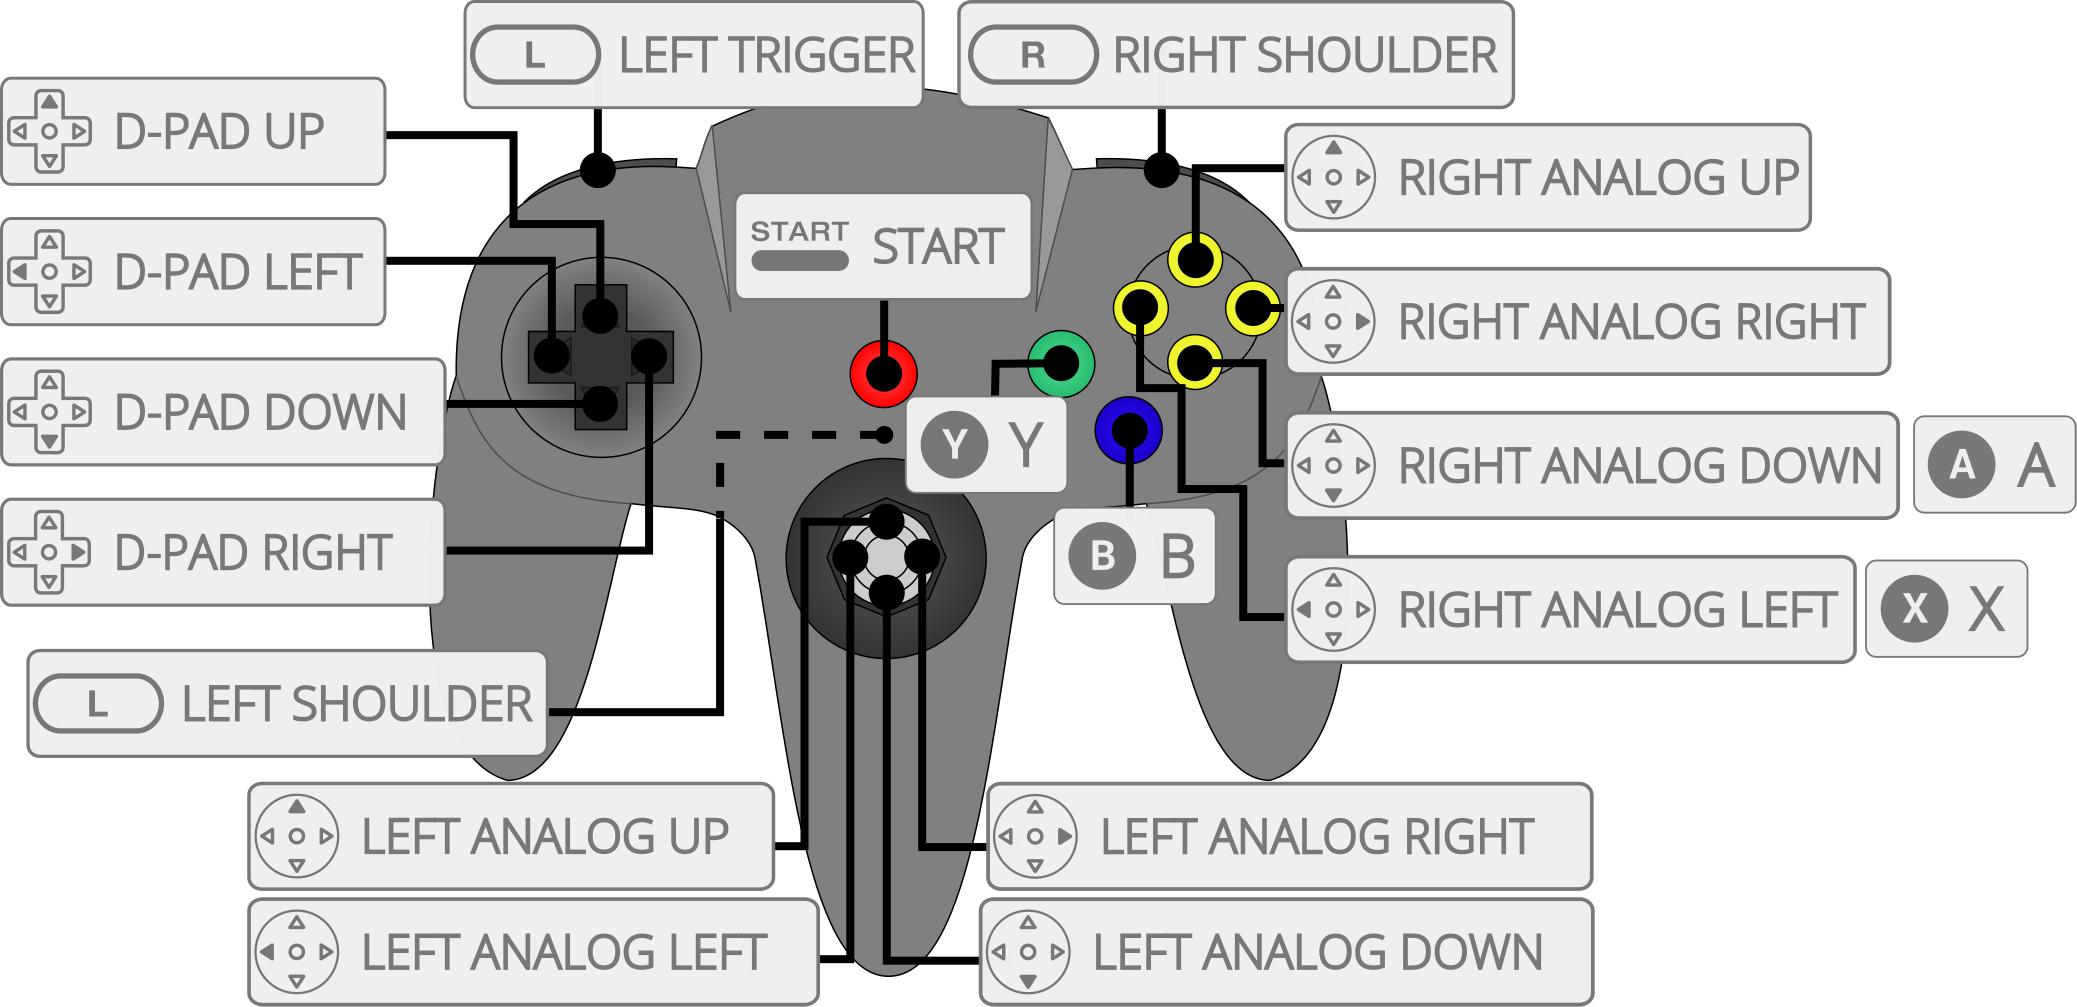 Nintendo N64 Mupen64plus Diagram Retropie Controller N64 Setup